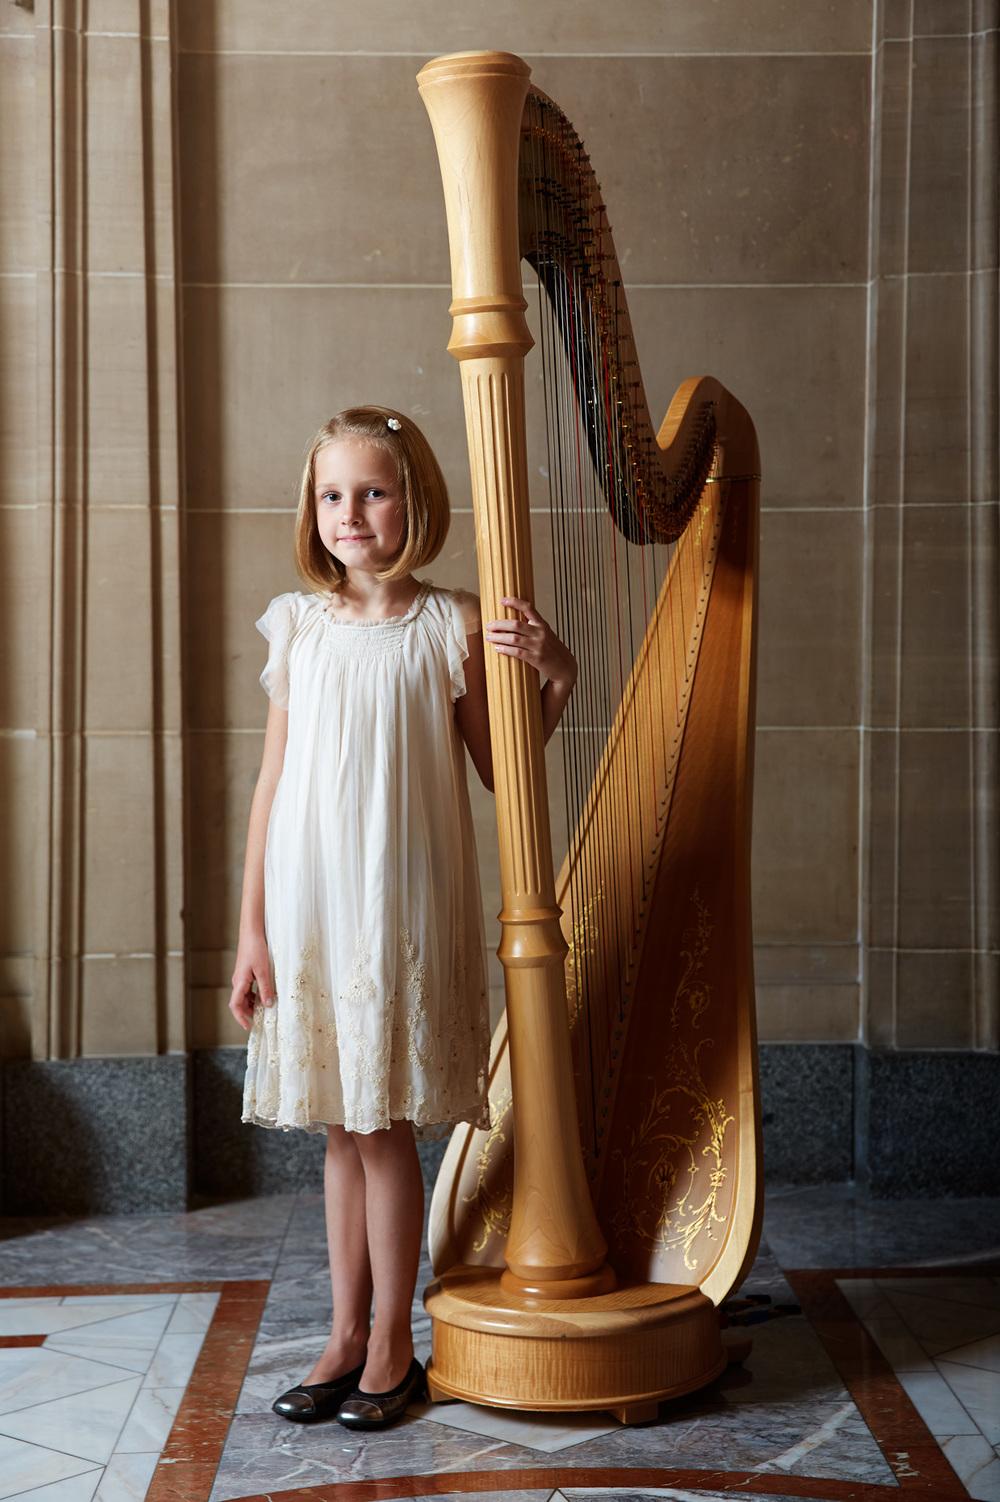 Portrait Photography Derek Israelsen Kid Harp